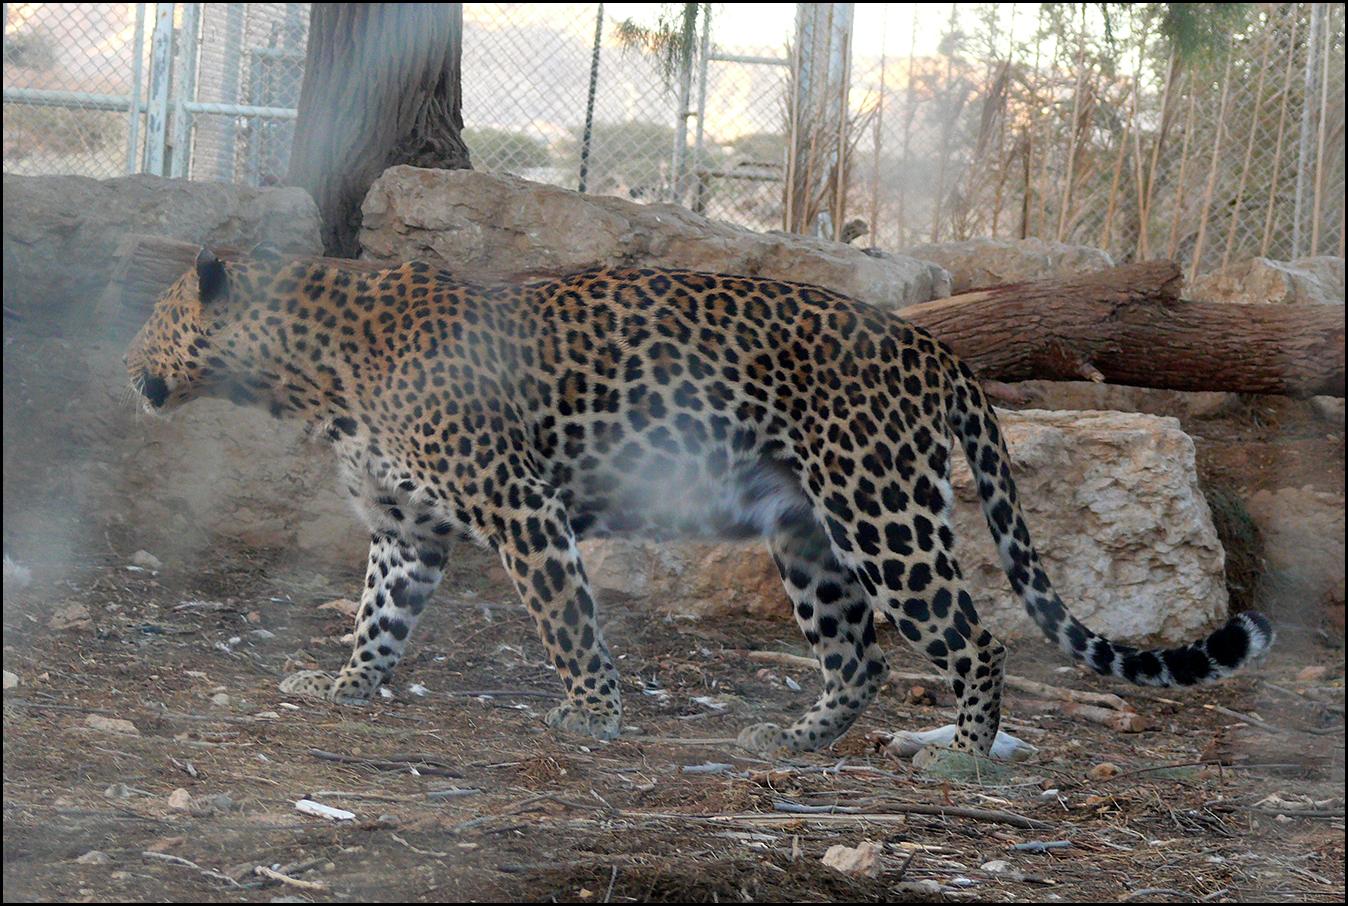 https://upload.wikimedia.org/wikipedia/commons/0/09/Leopard_-_Hai-Bar_Yotvata_2013.jpg